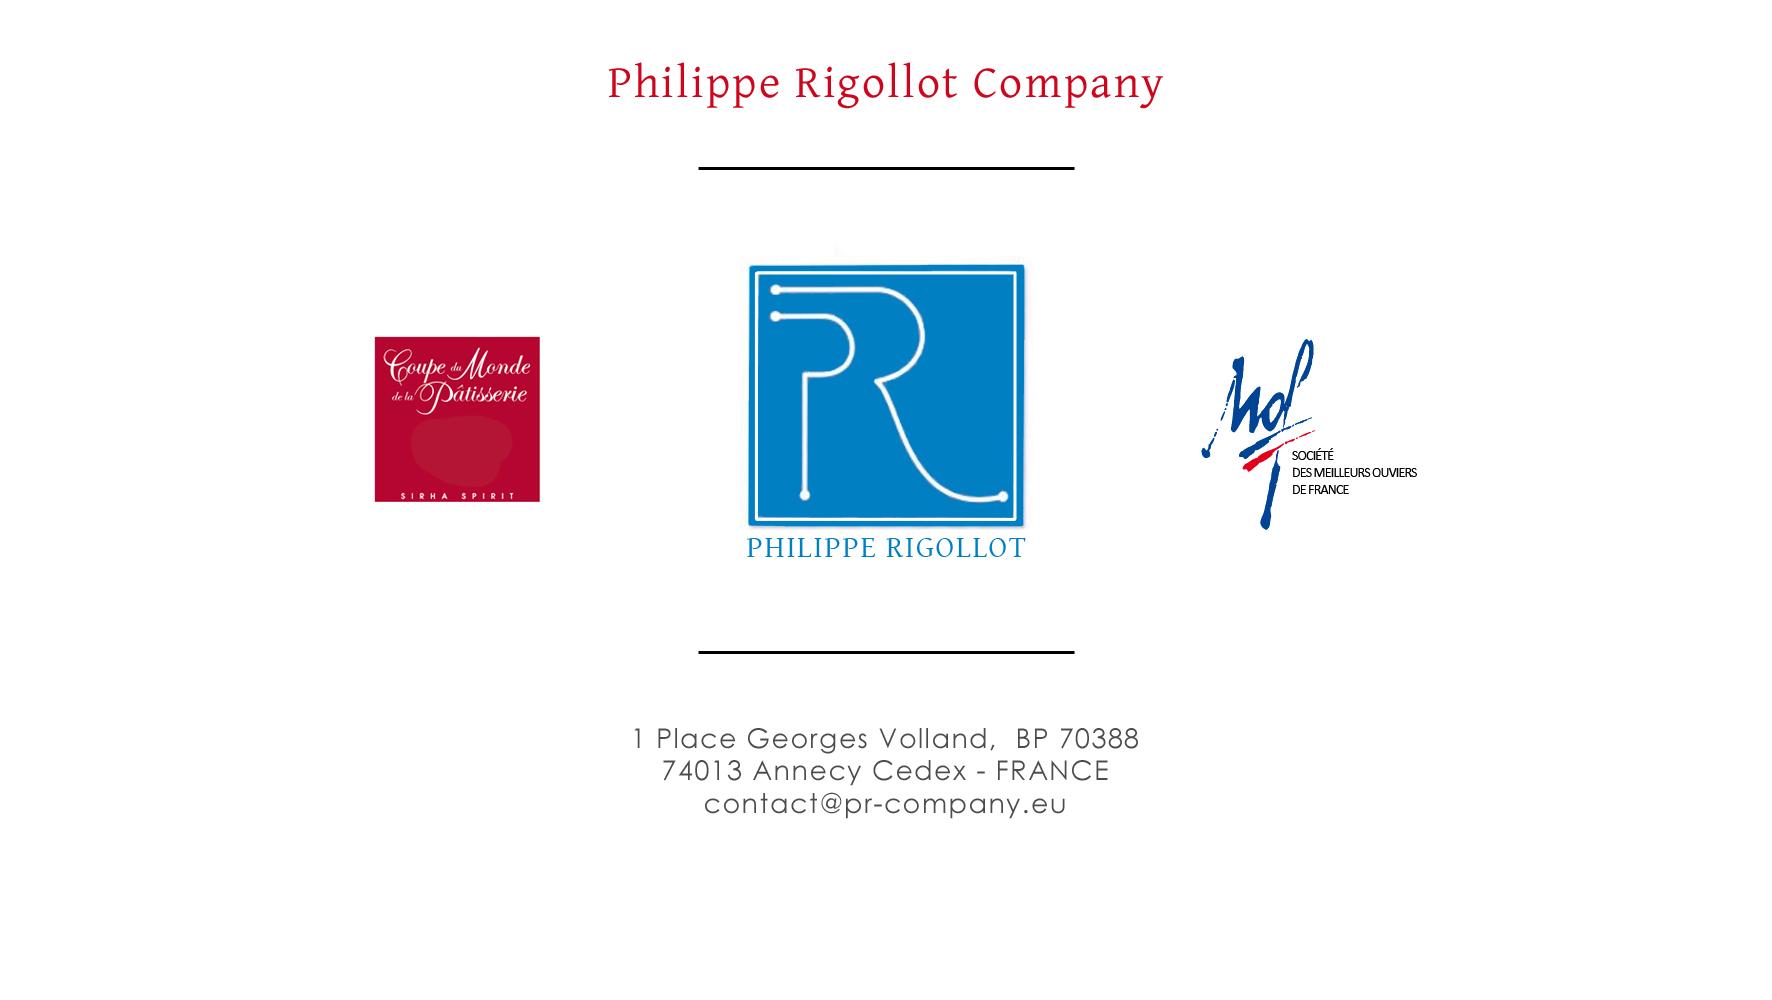 Phillipe Rigollot Company L'excellence au service de la gourmandise